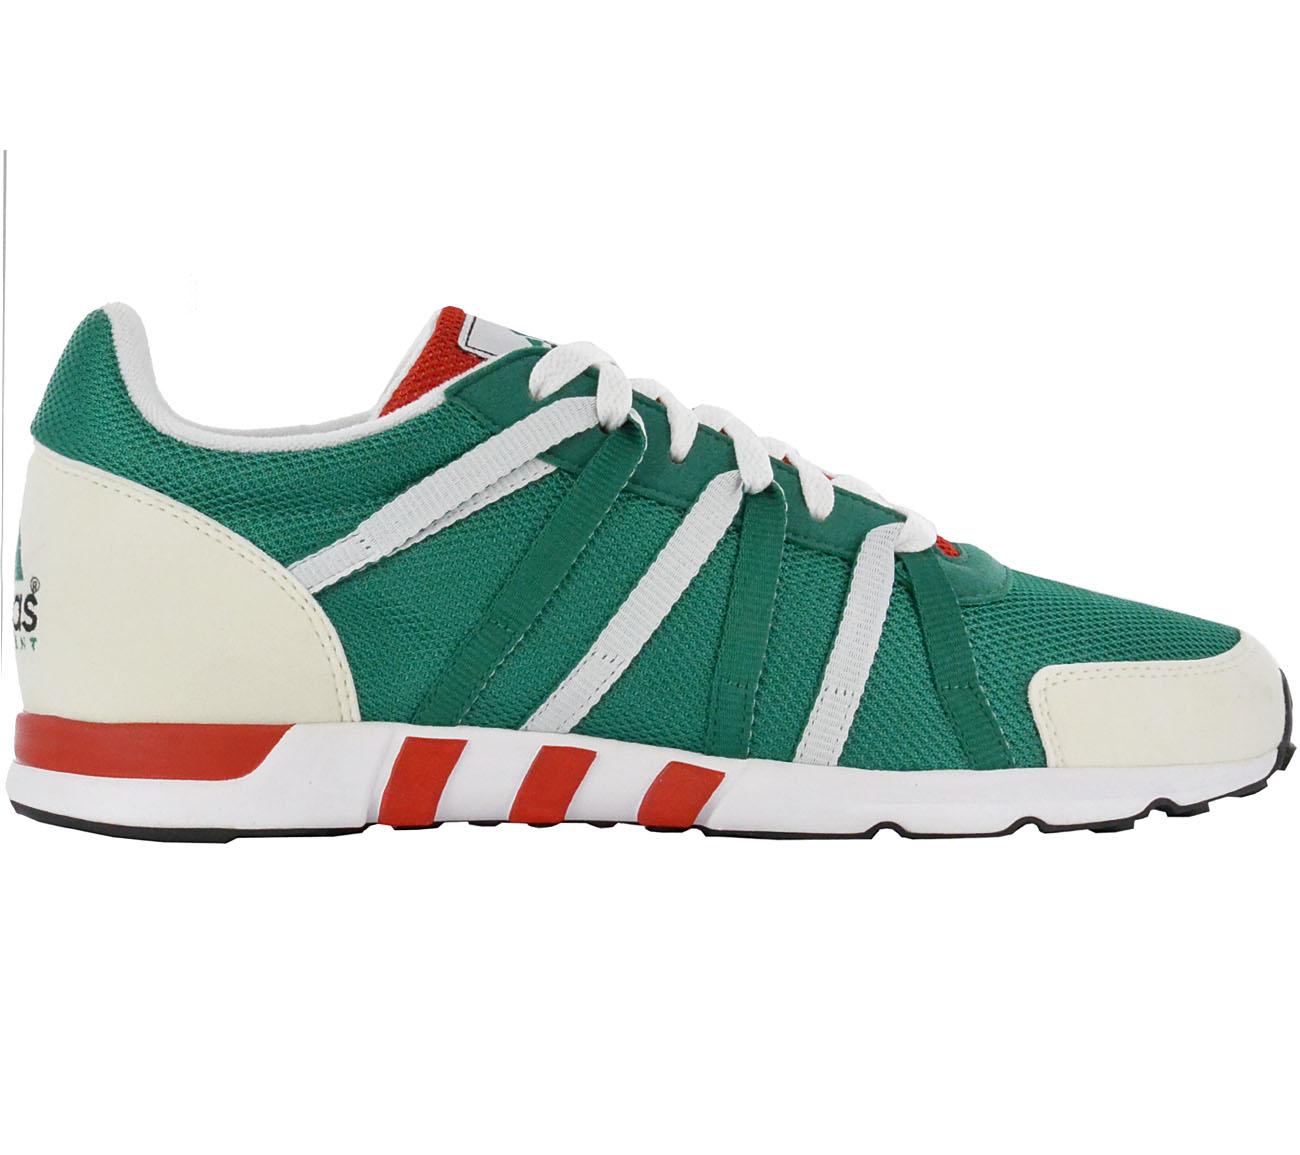 Adidas Herren 750 Sneaker Schuhe Freizeit Turnschuhe ZX 750 Herren 700 Equipment Support 7cbe5c